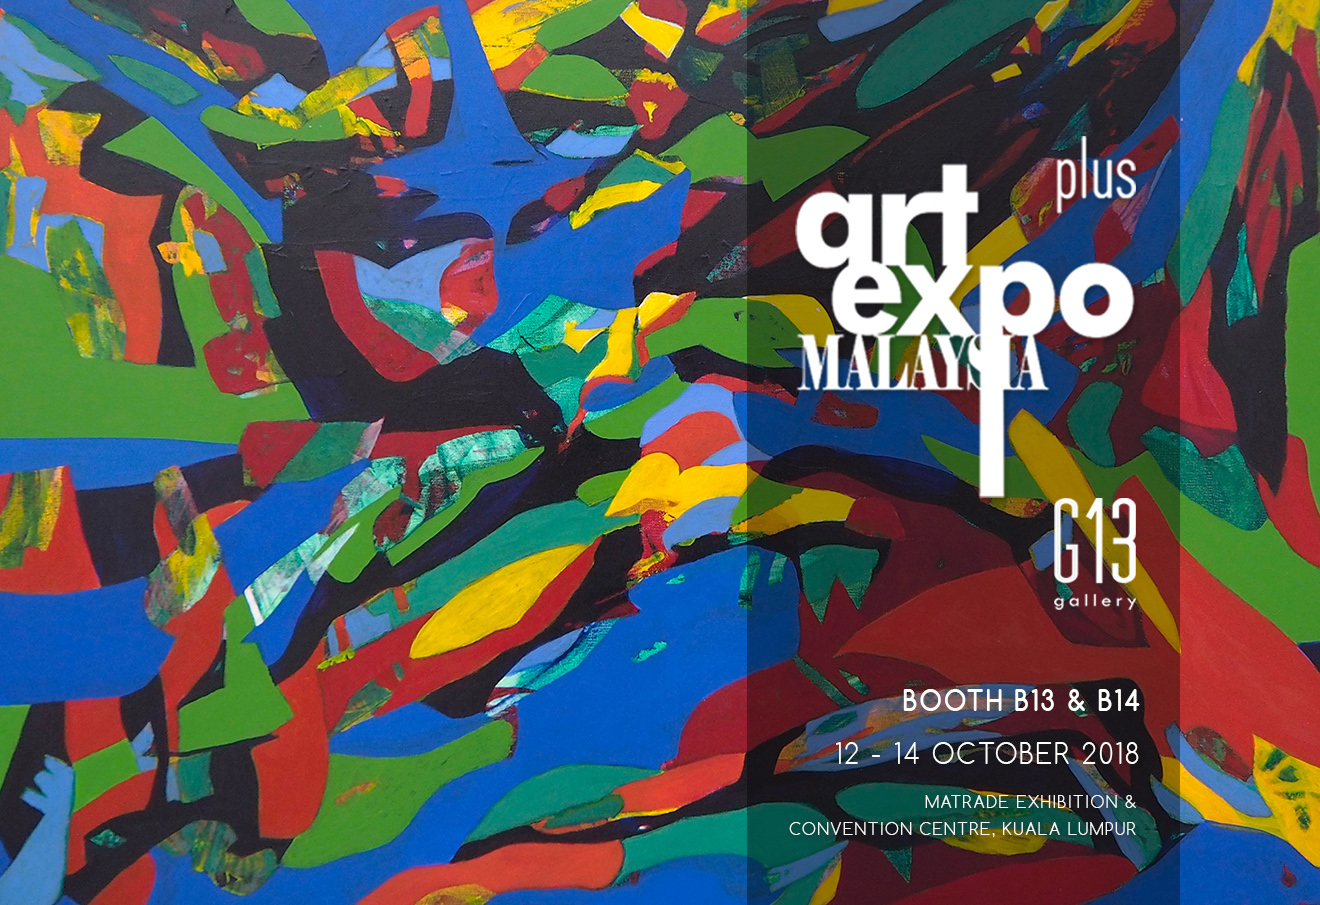 ART EXPO PLUS MALAYSIA 2018